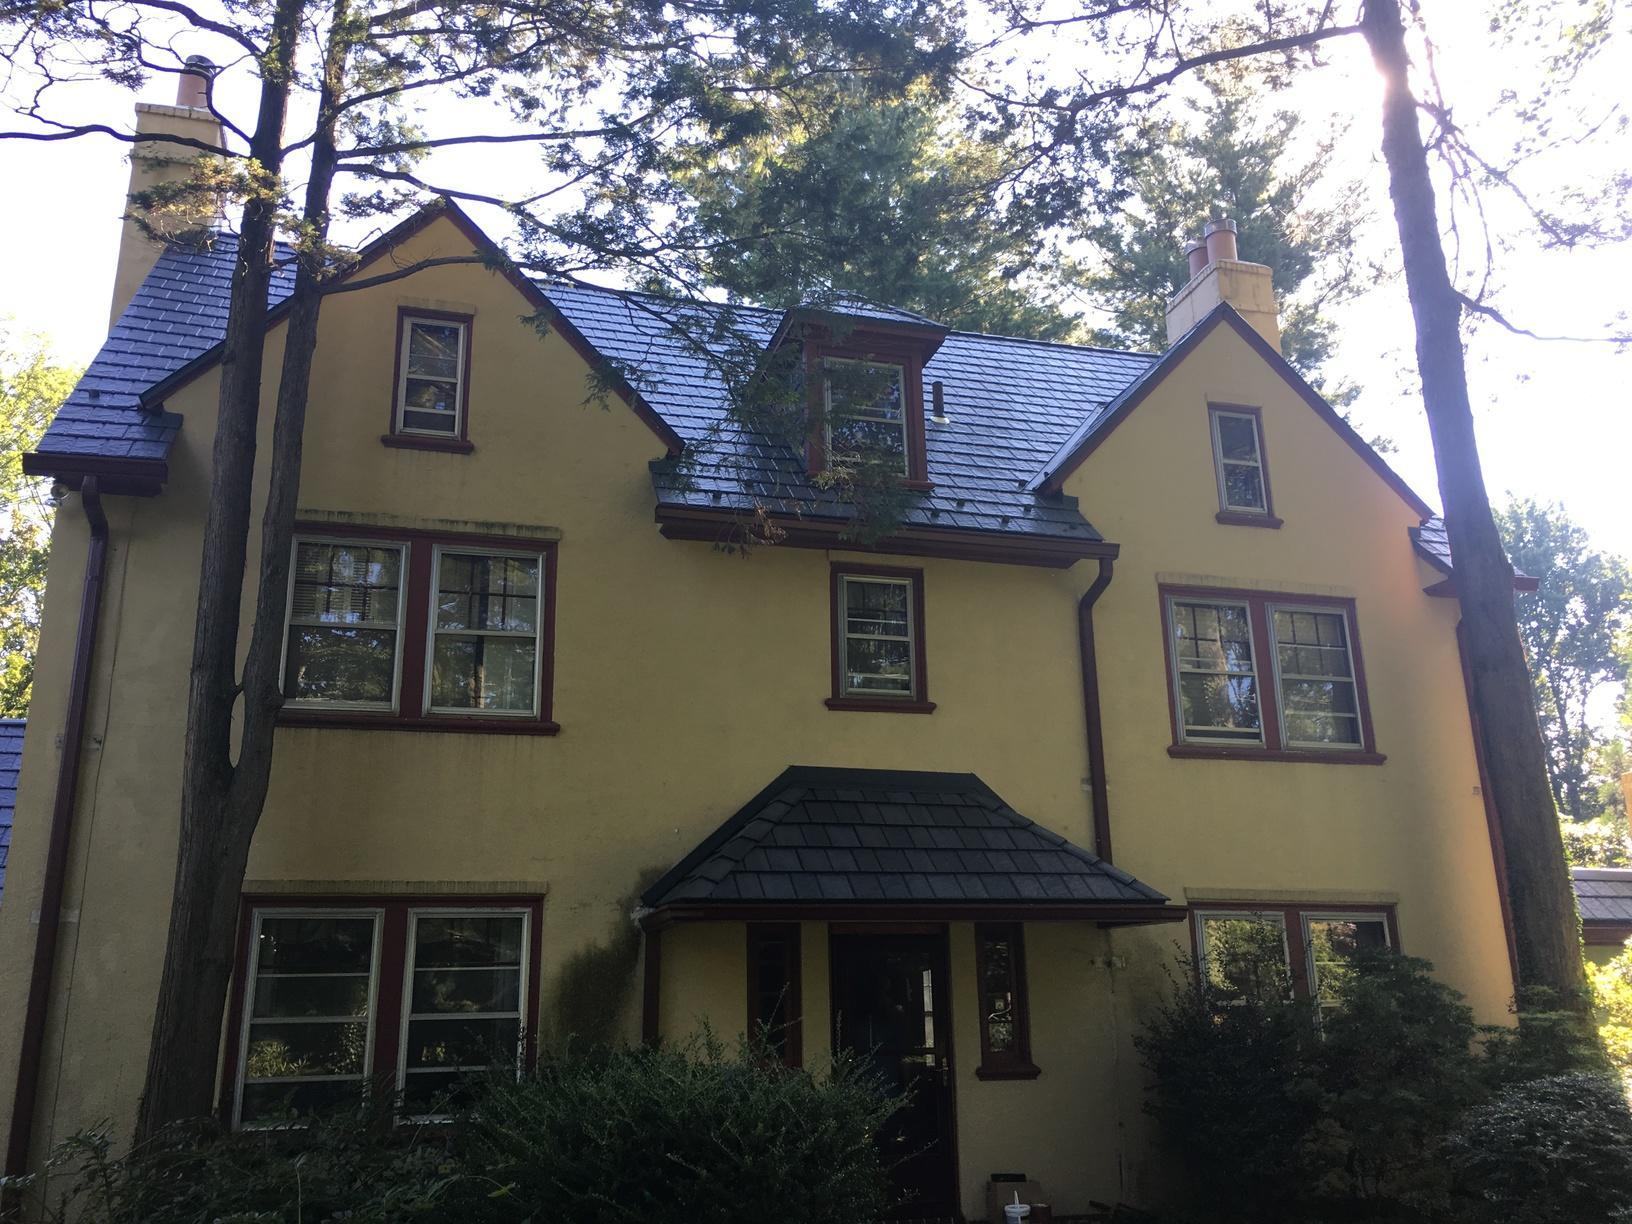 Edco ArrowLine Slate Roof Install in Villanova, PA